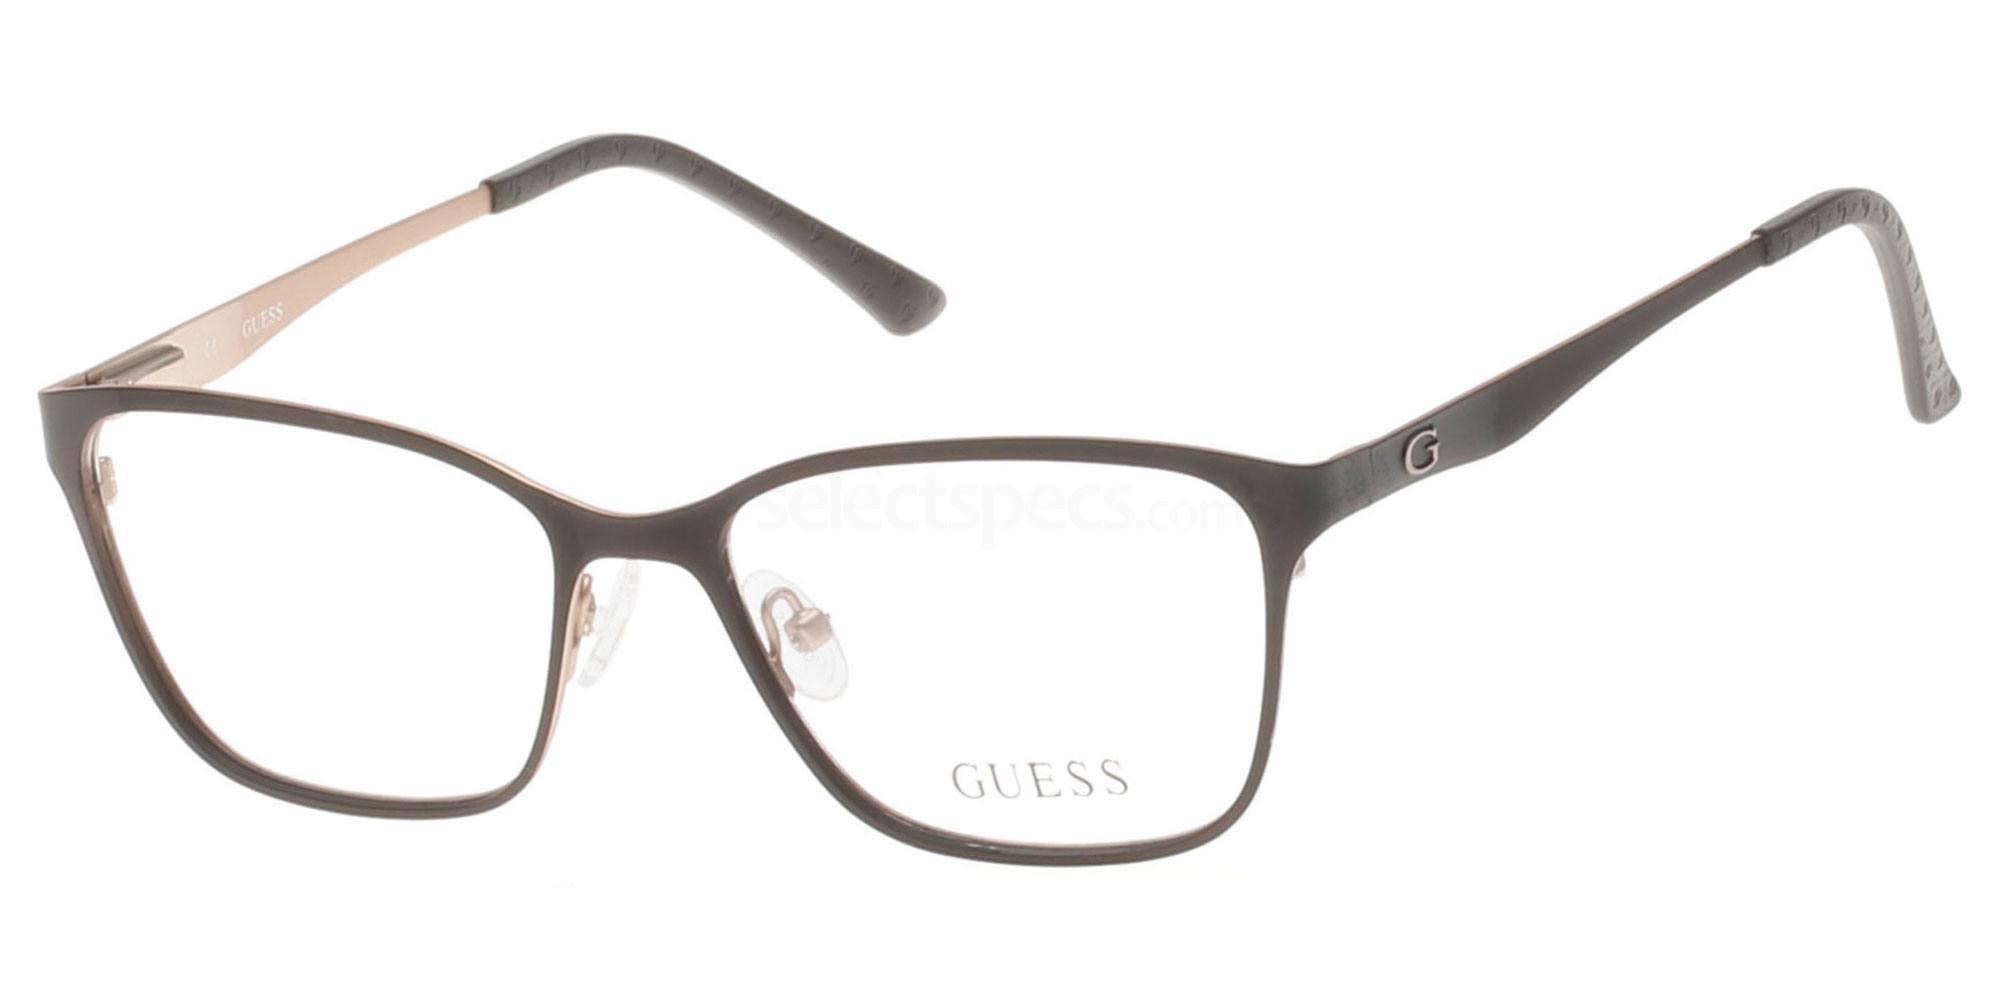 002 GU2511 Glasses, Guess